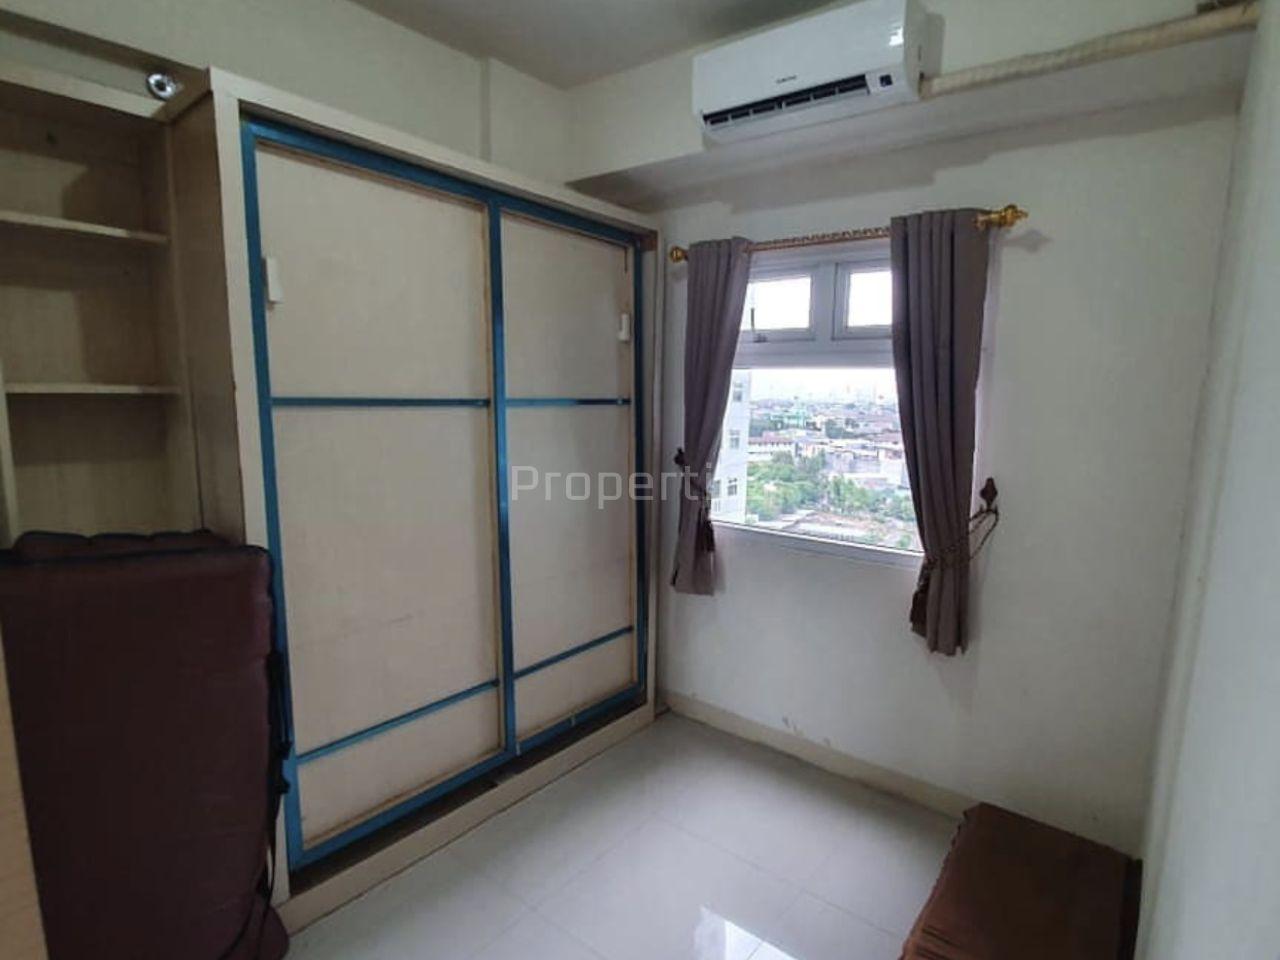 2 in 1-2BR Apartment Unit at Green Pramuka City, Jakarta Pusat